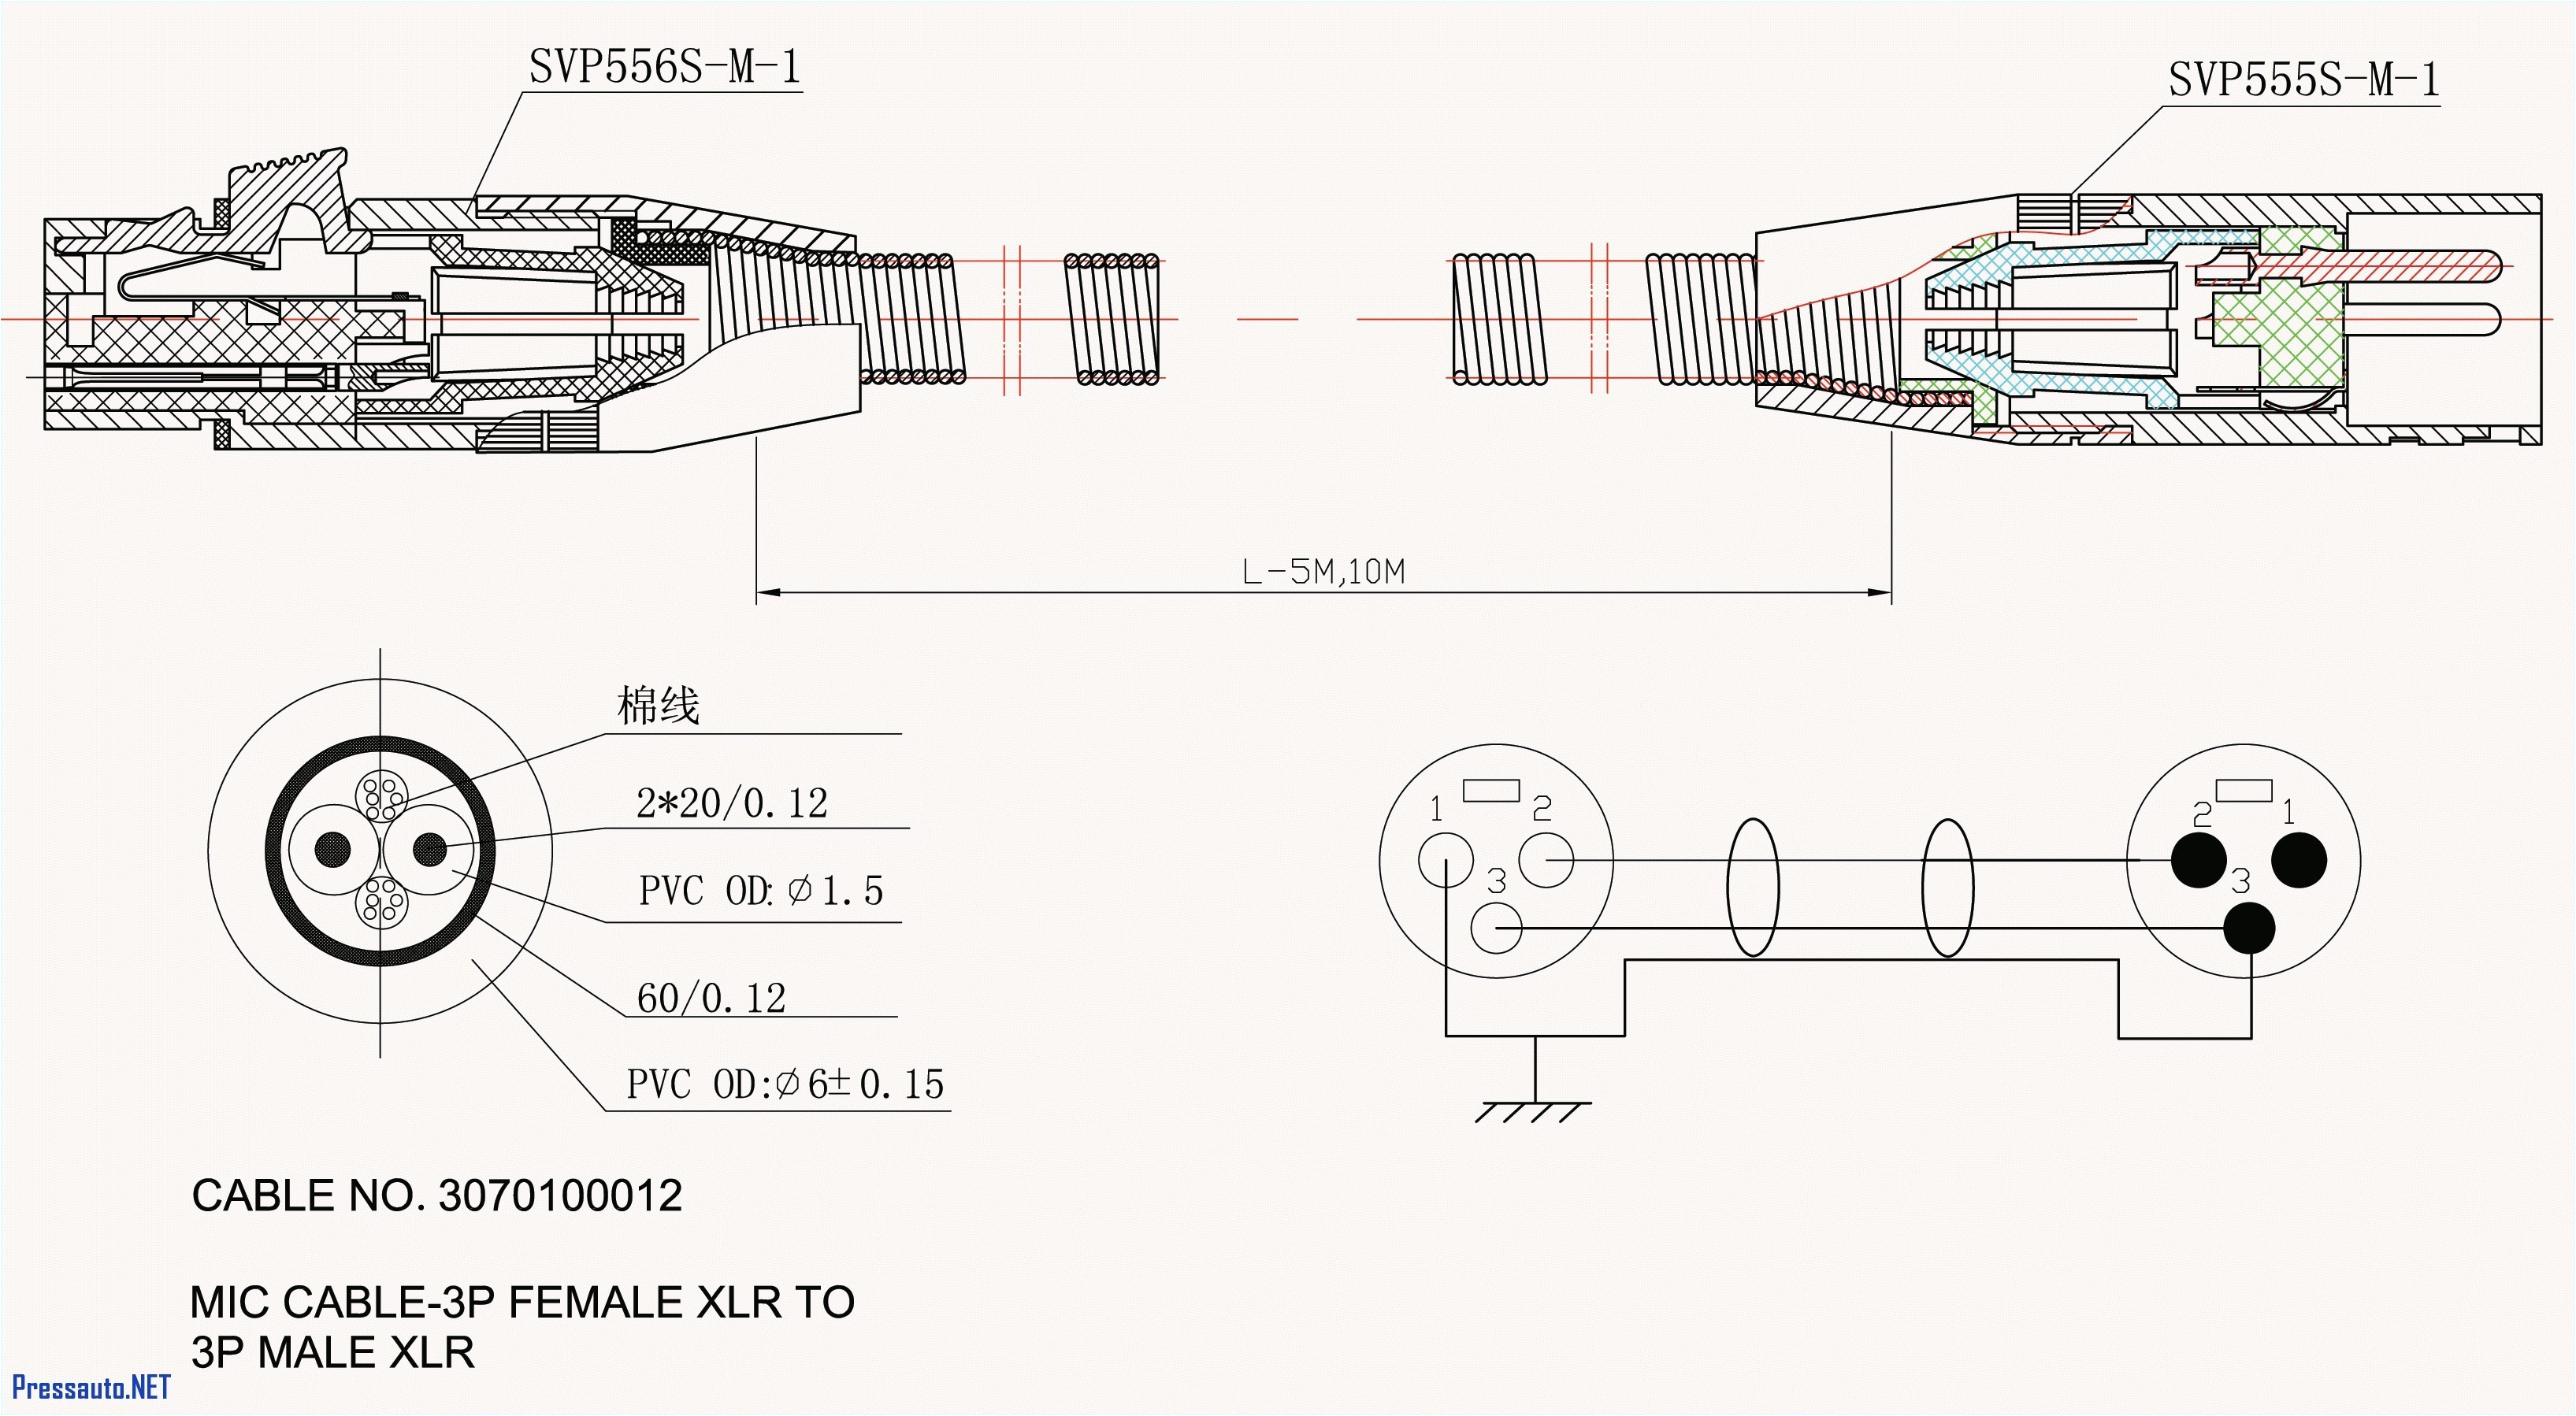 photocell wiring diagram pdf wiring diagram image 12 volt solenoid wiring diagram 240 volt cell wiring